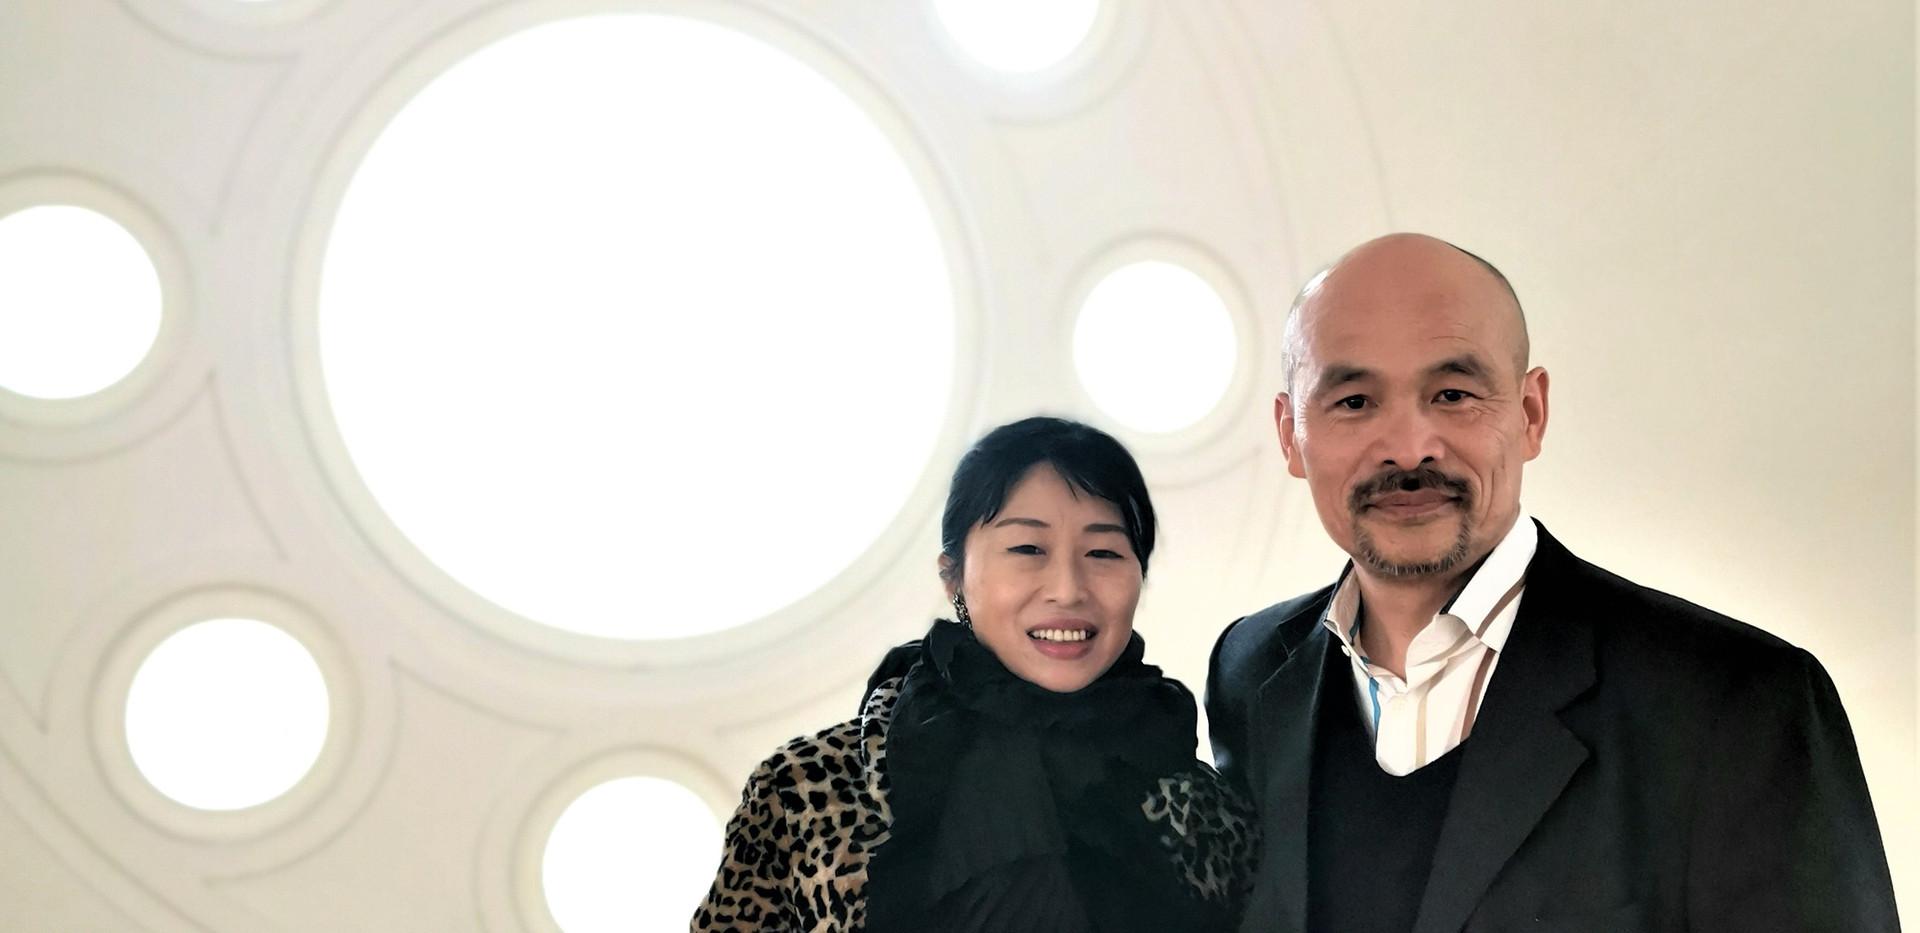 Xiao Ge und Ren Rong